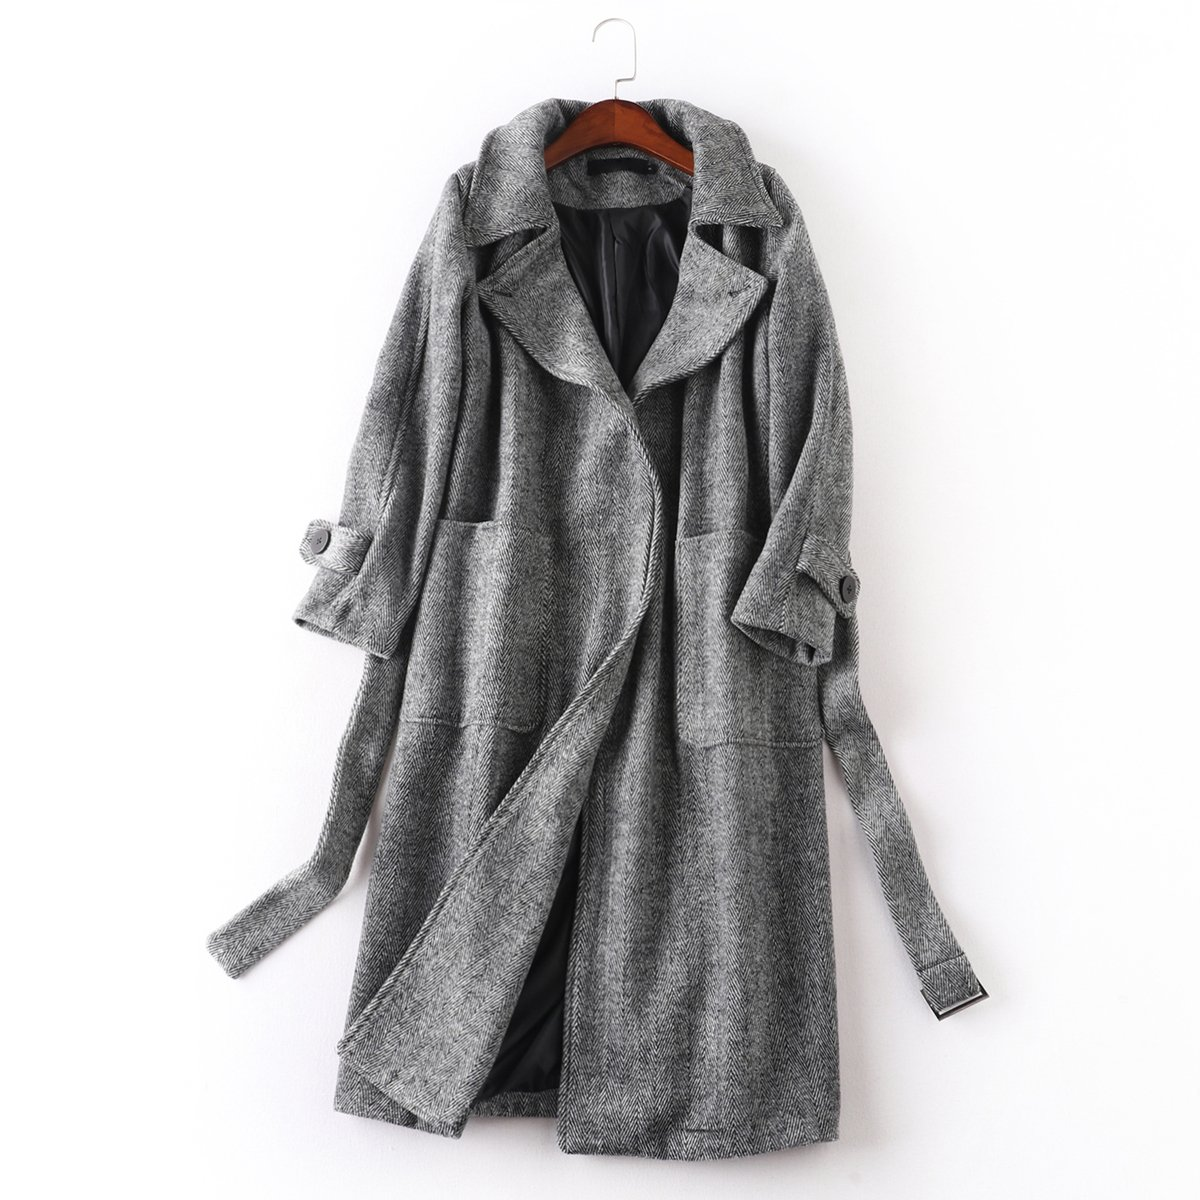 Pugaomsiw einfache und Elegante Wolle Mantel Winter Mode Knie Lange Jacke locker gürtel Wolle Mantel,L,Grau